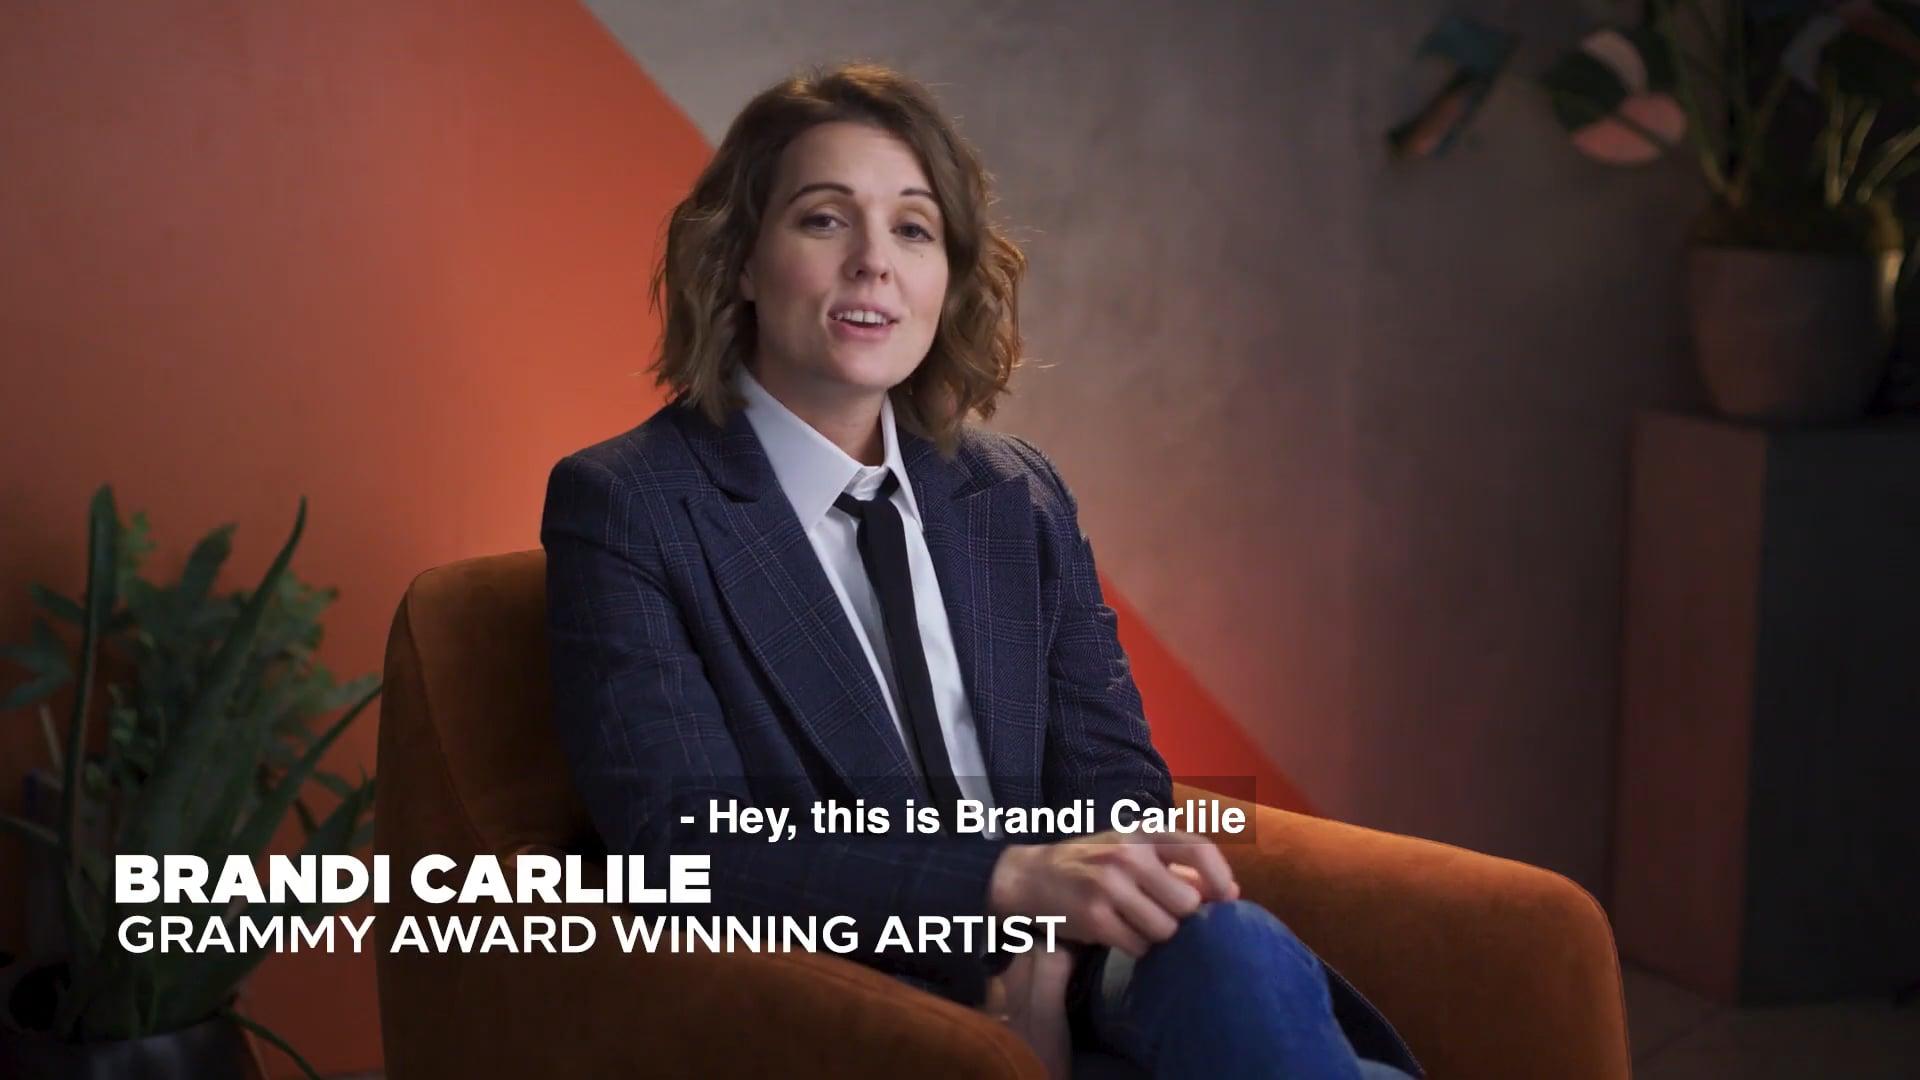 Brandi Carlile - Wine Tasting